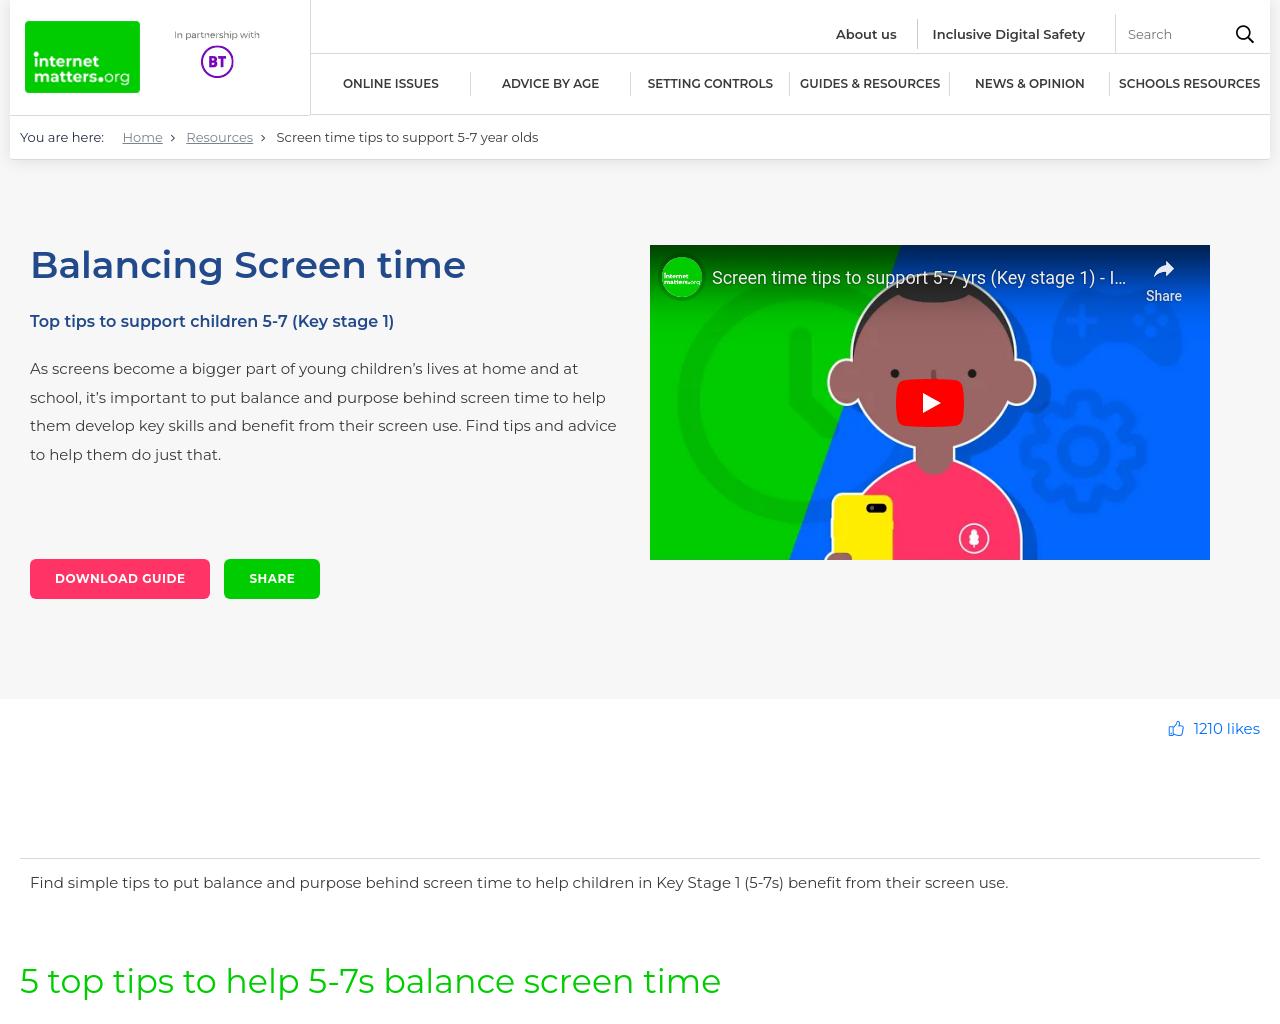 Balancing Screen Time 5-7yr olds